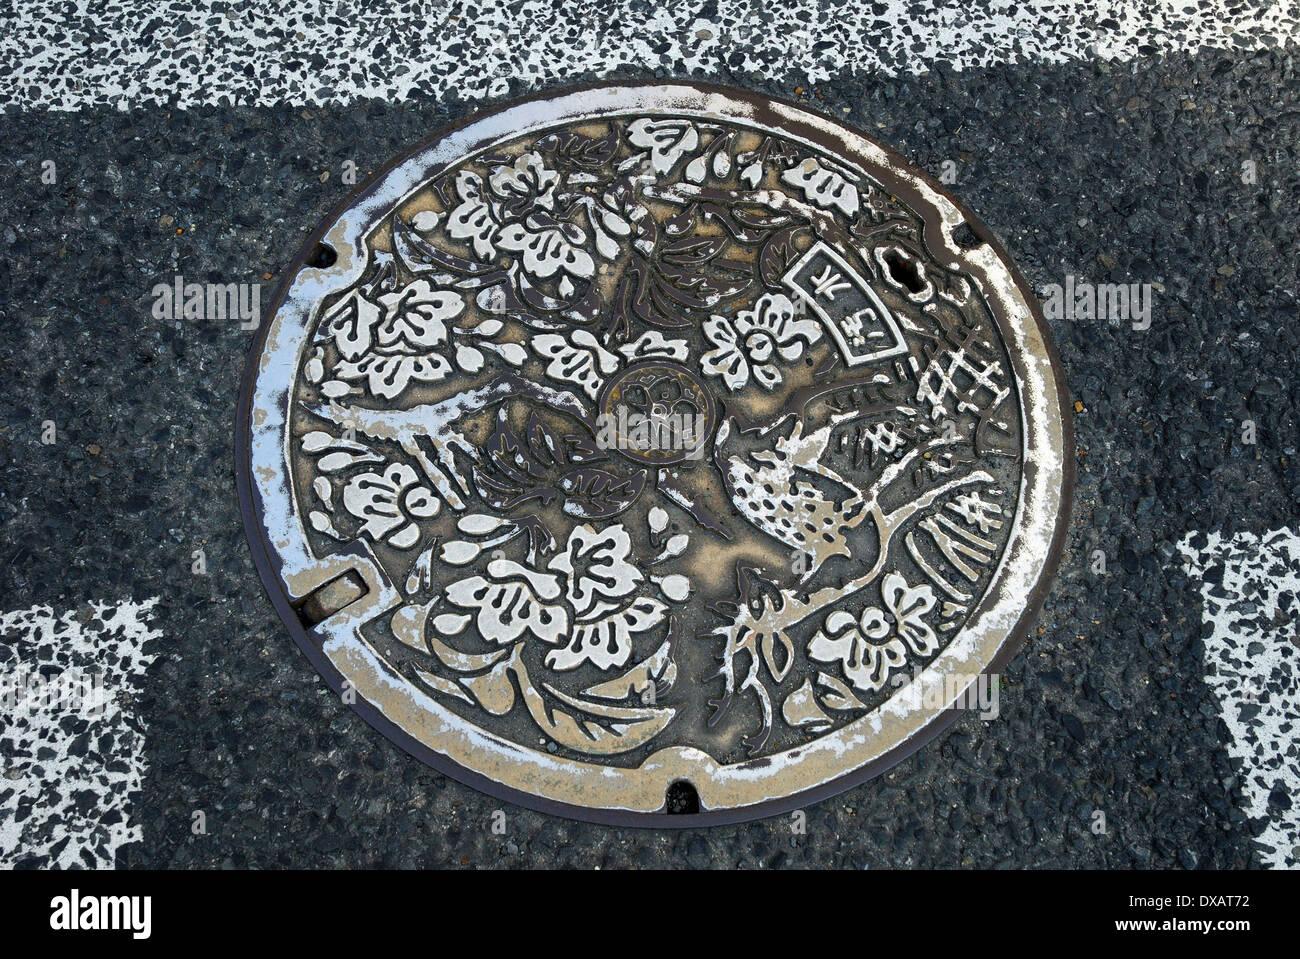 Manhole cover, Nara - Stock Image